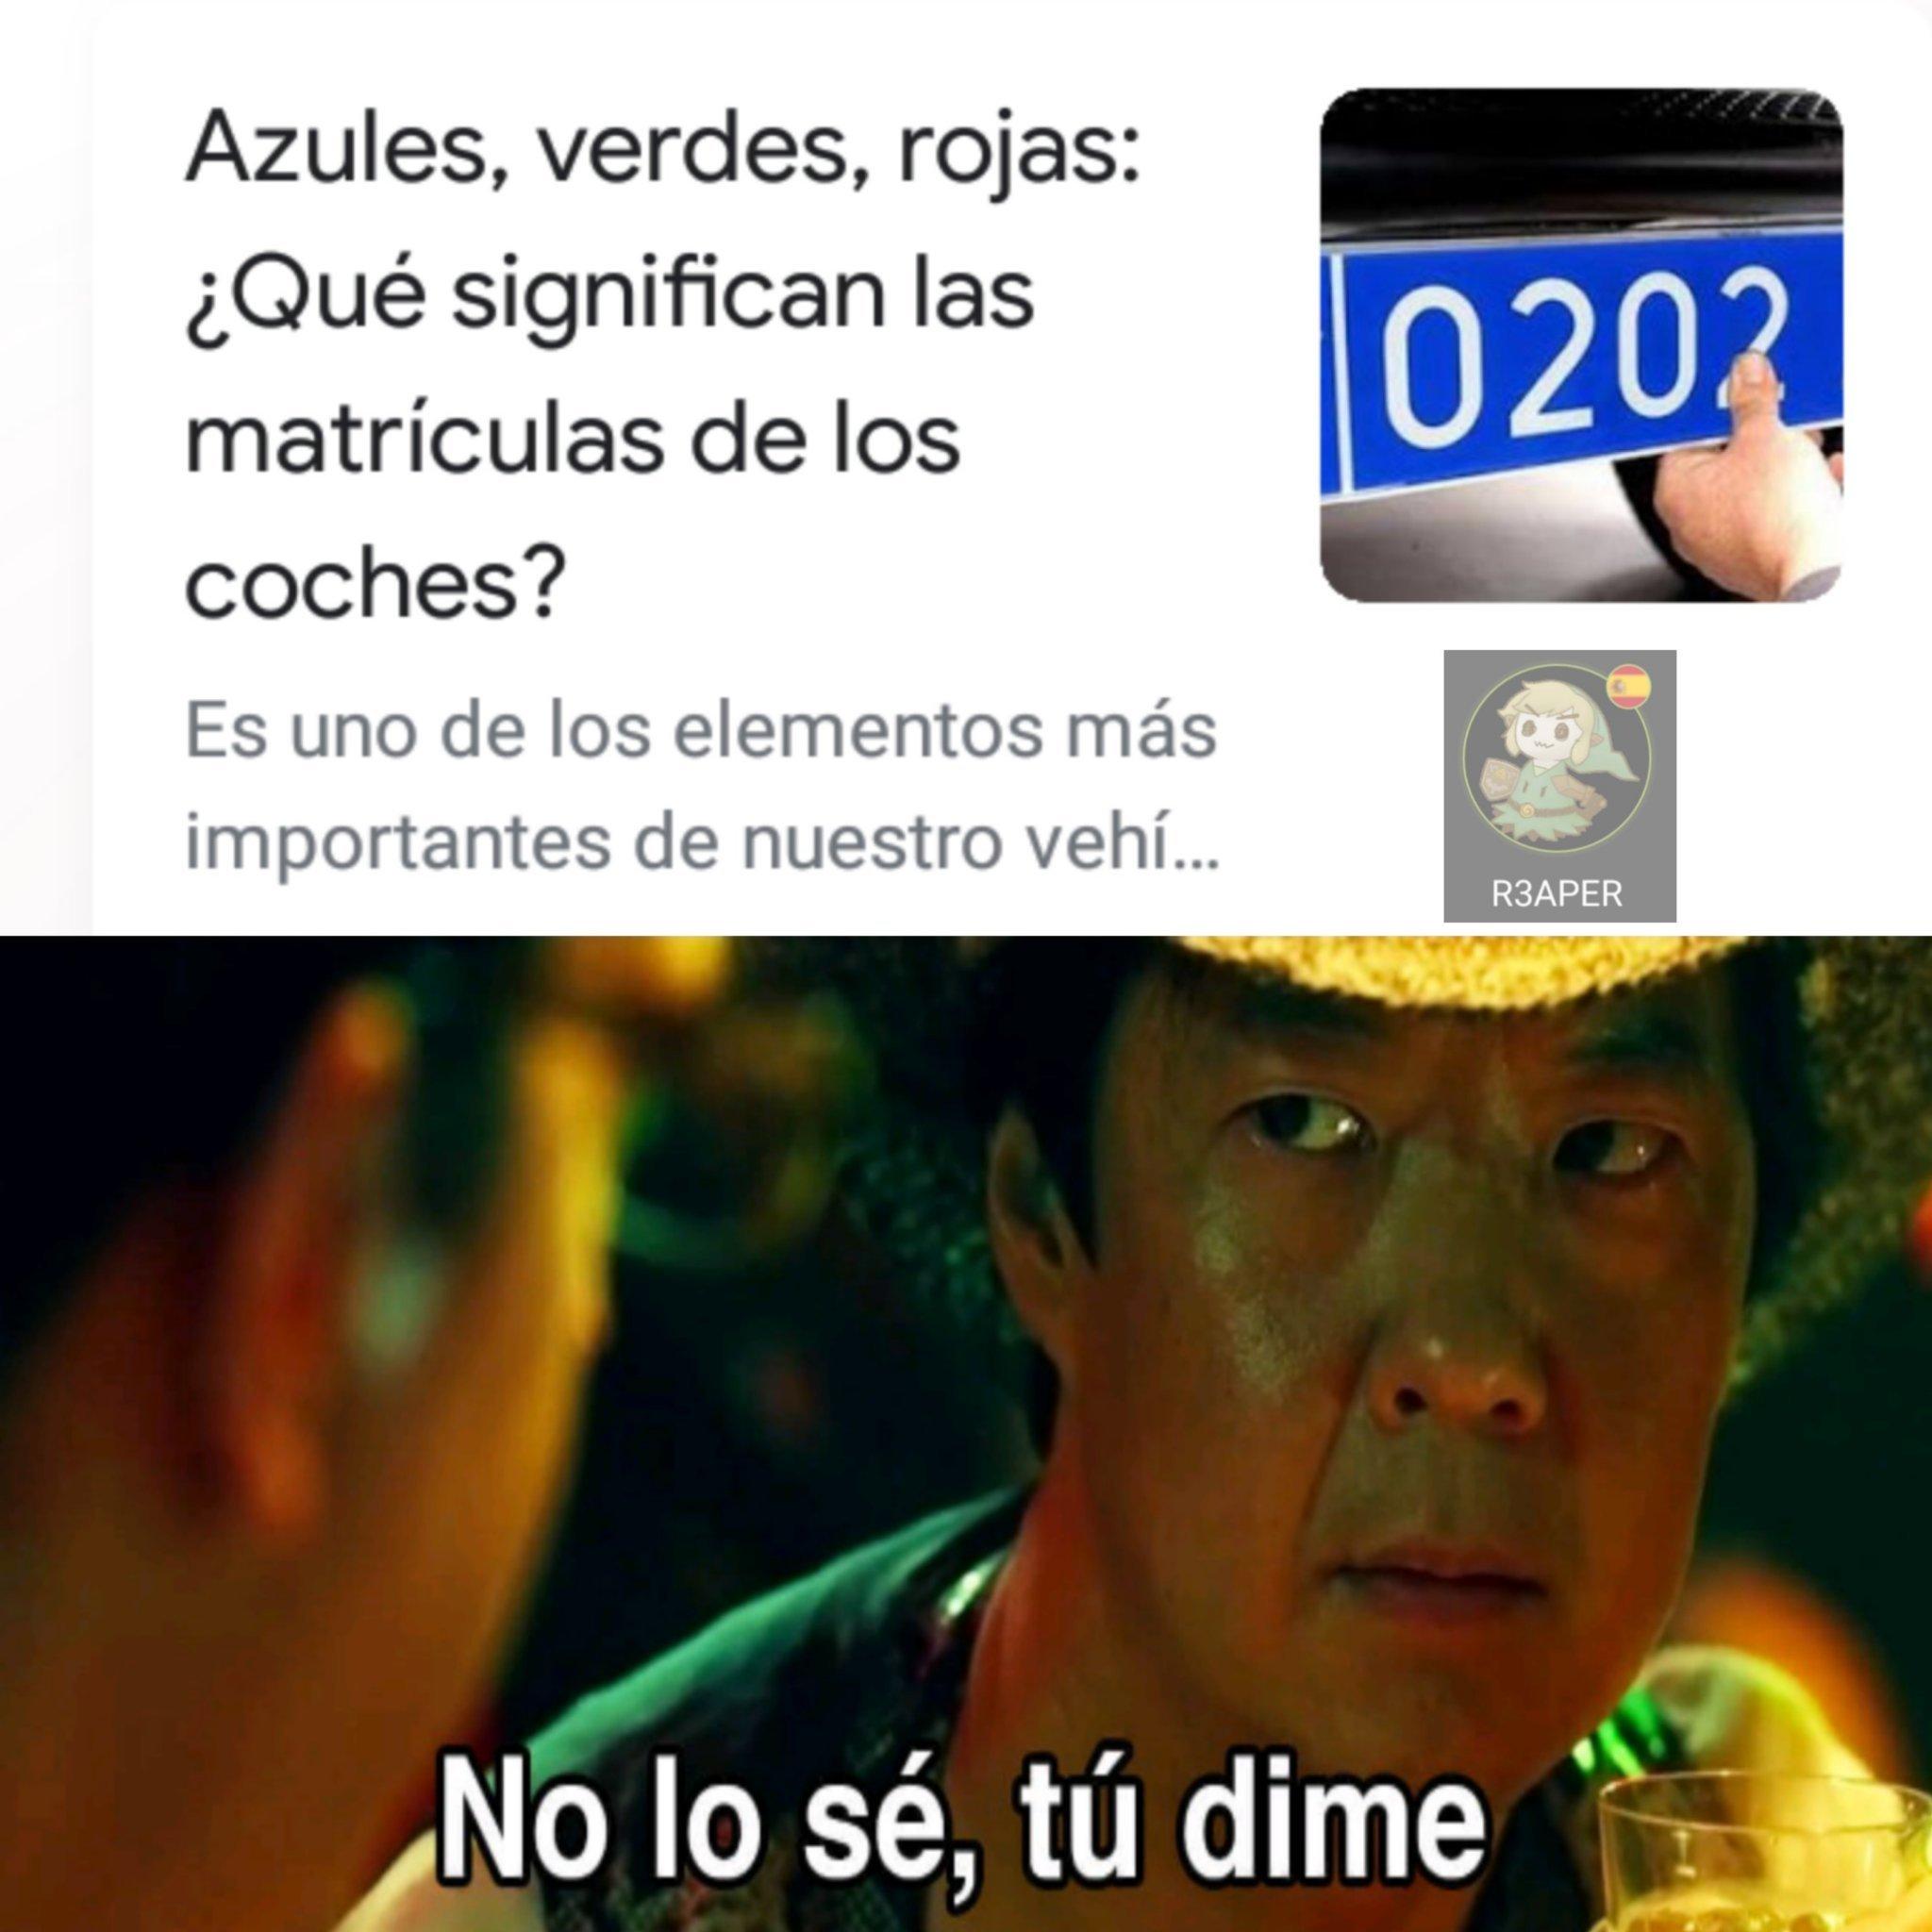 0202 - meme